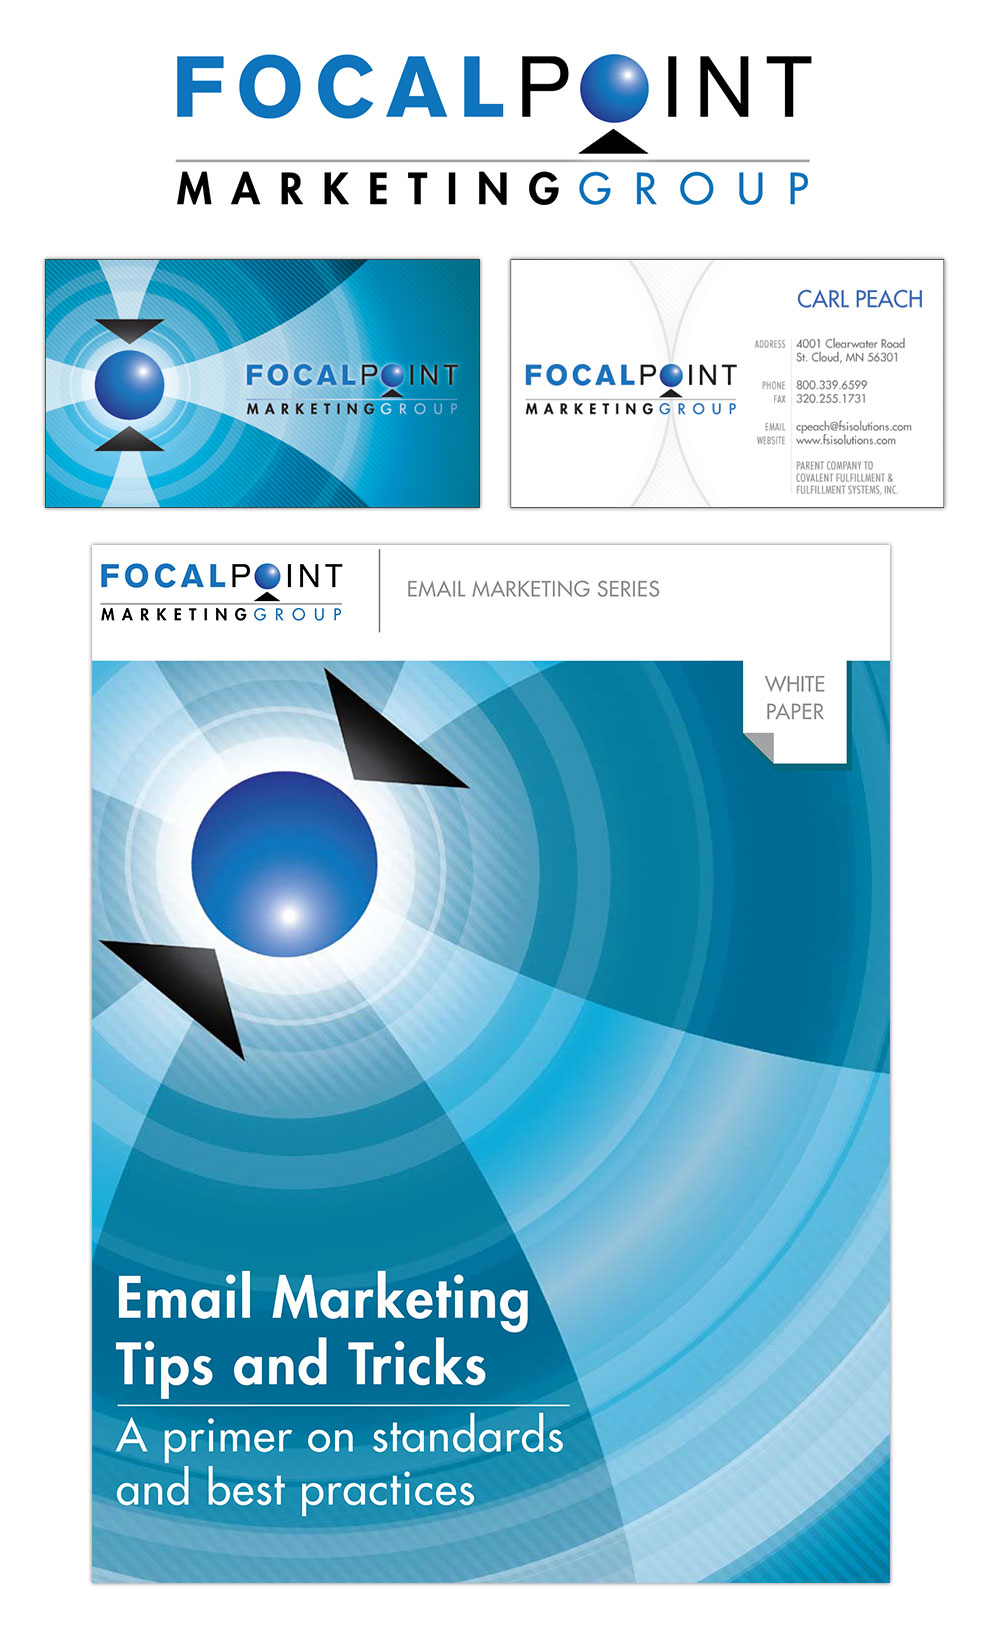 FocalPoint_Branding